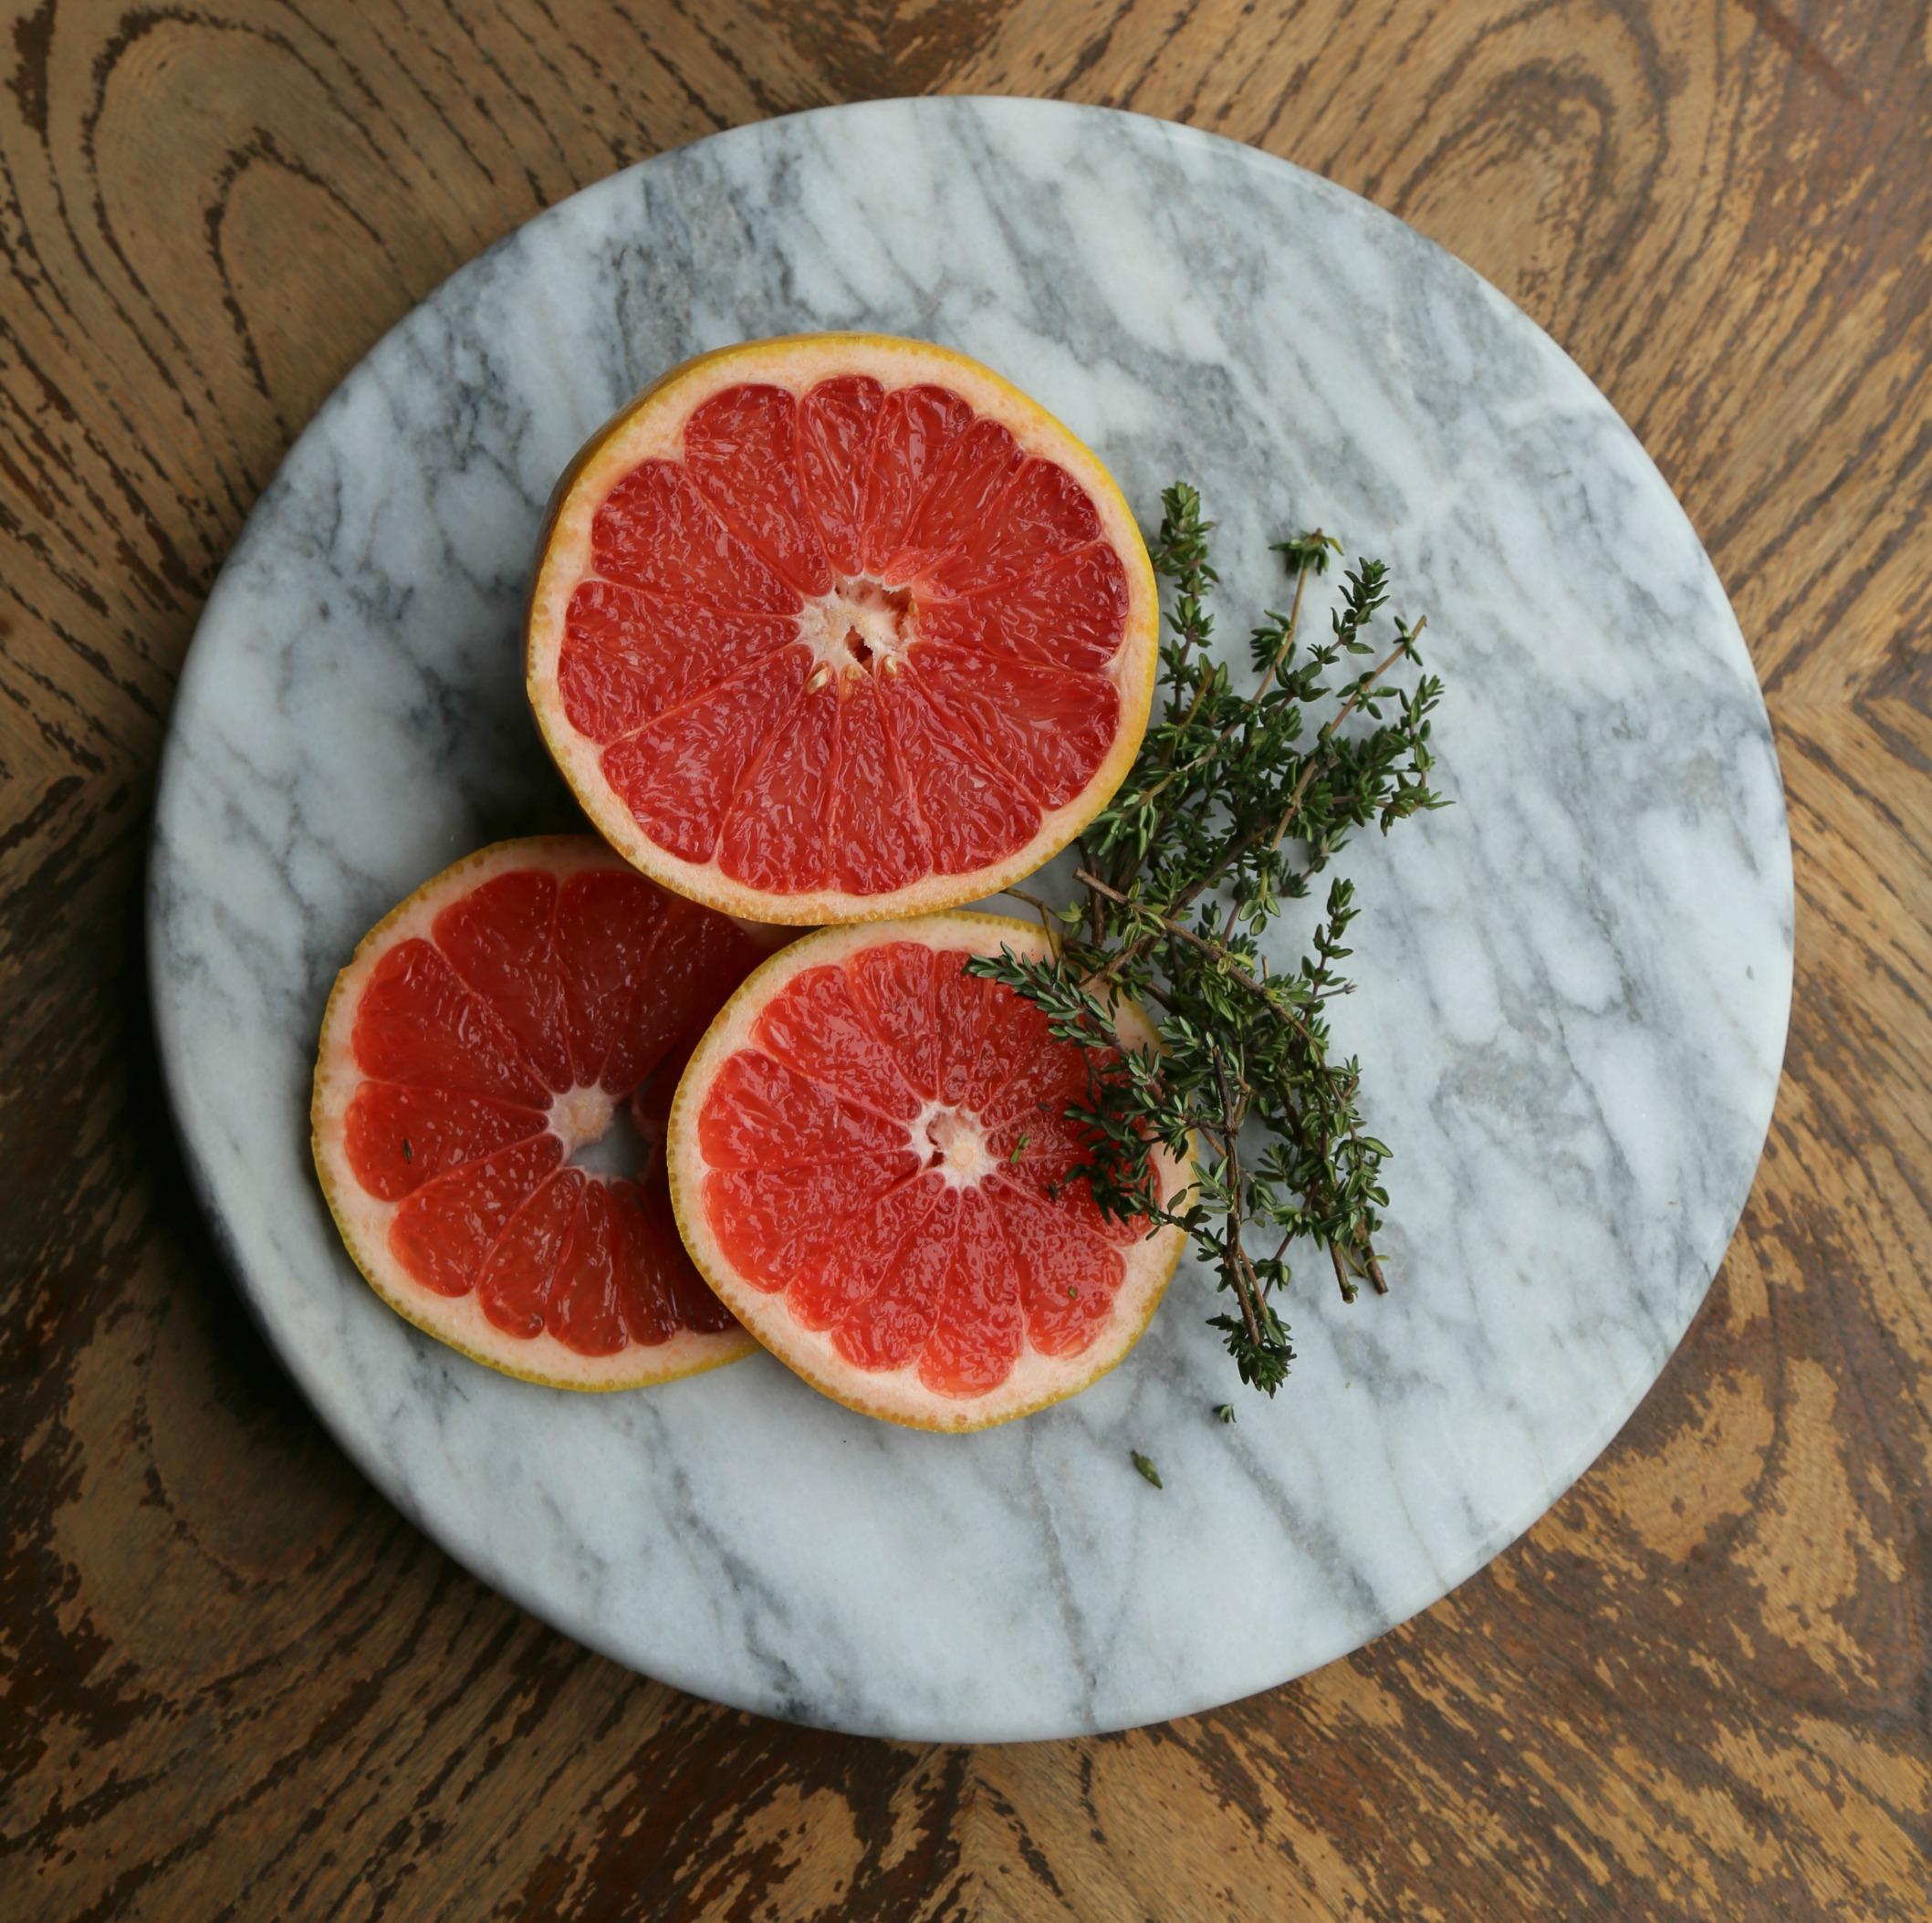 grapefruit-thyme-mocktail-vianneyrodriguez-sweetlifebake